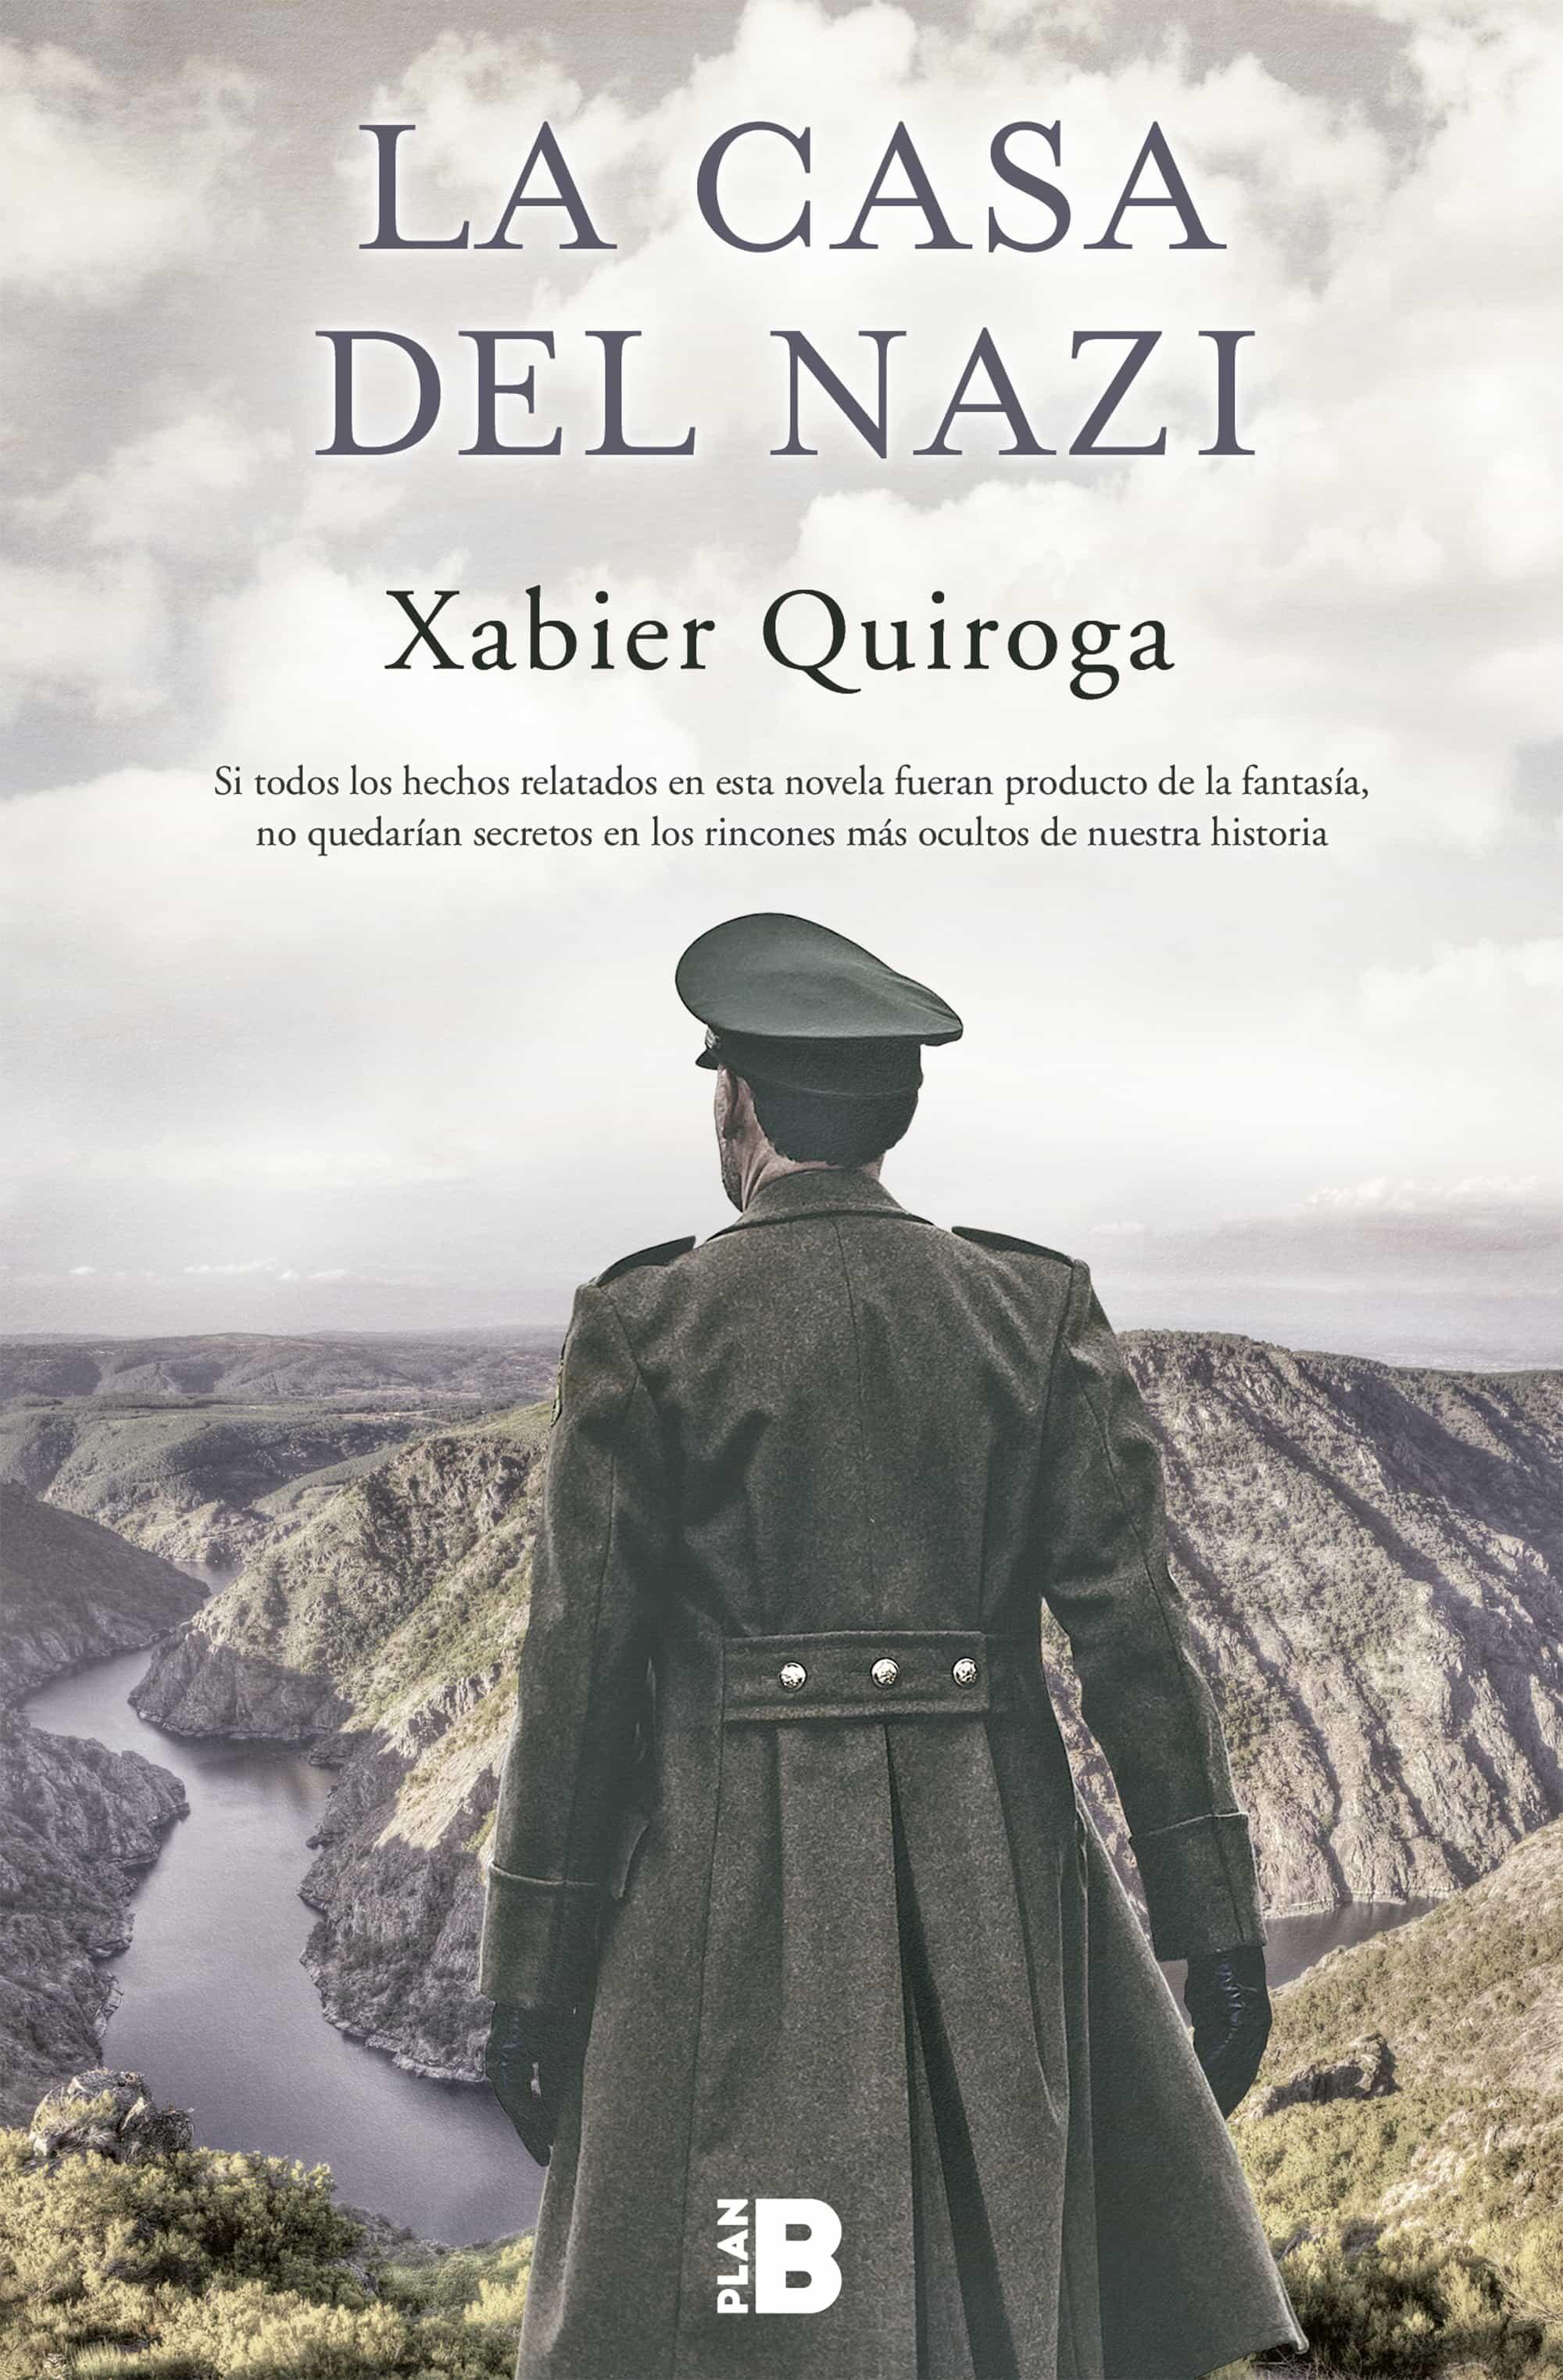 La casa del nazi- Xabier Quiroga 9788417001032